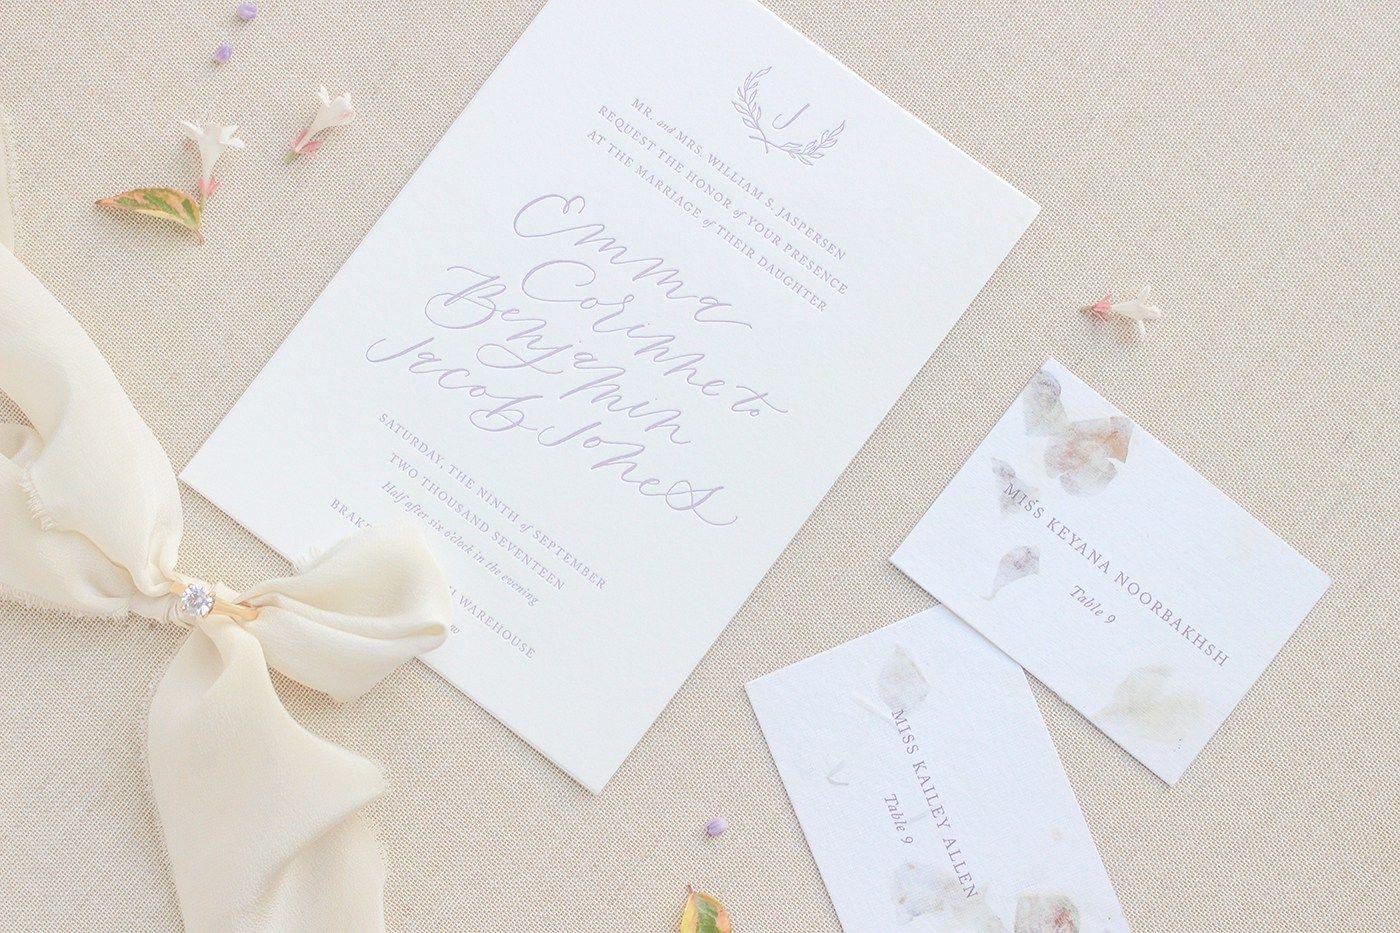 Wedding Invitations Dallas: Dallas Wedding Stationery Design // Emma + Ben: Semi